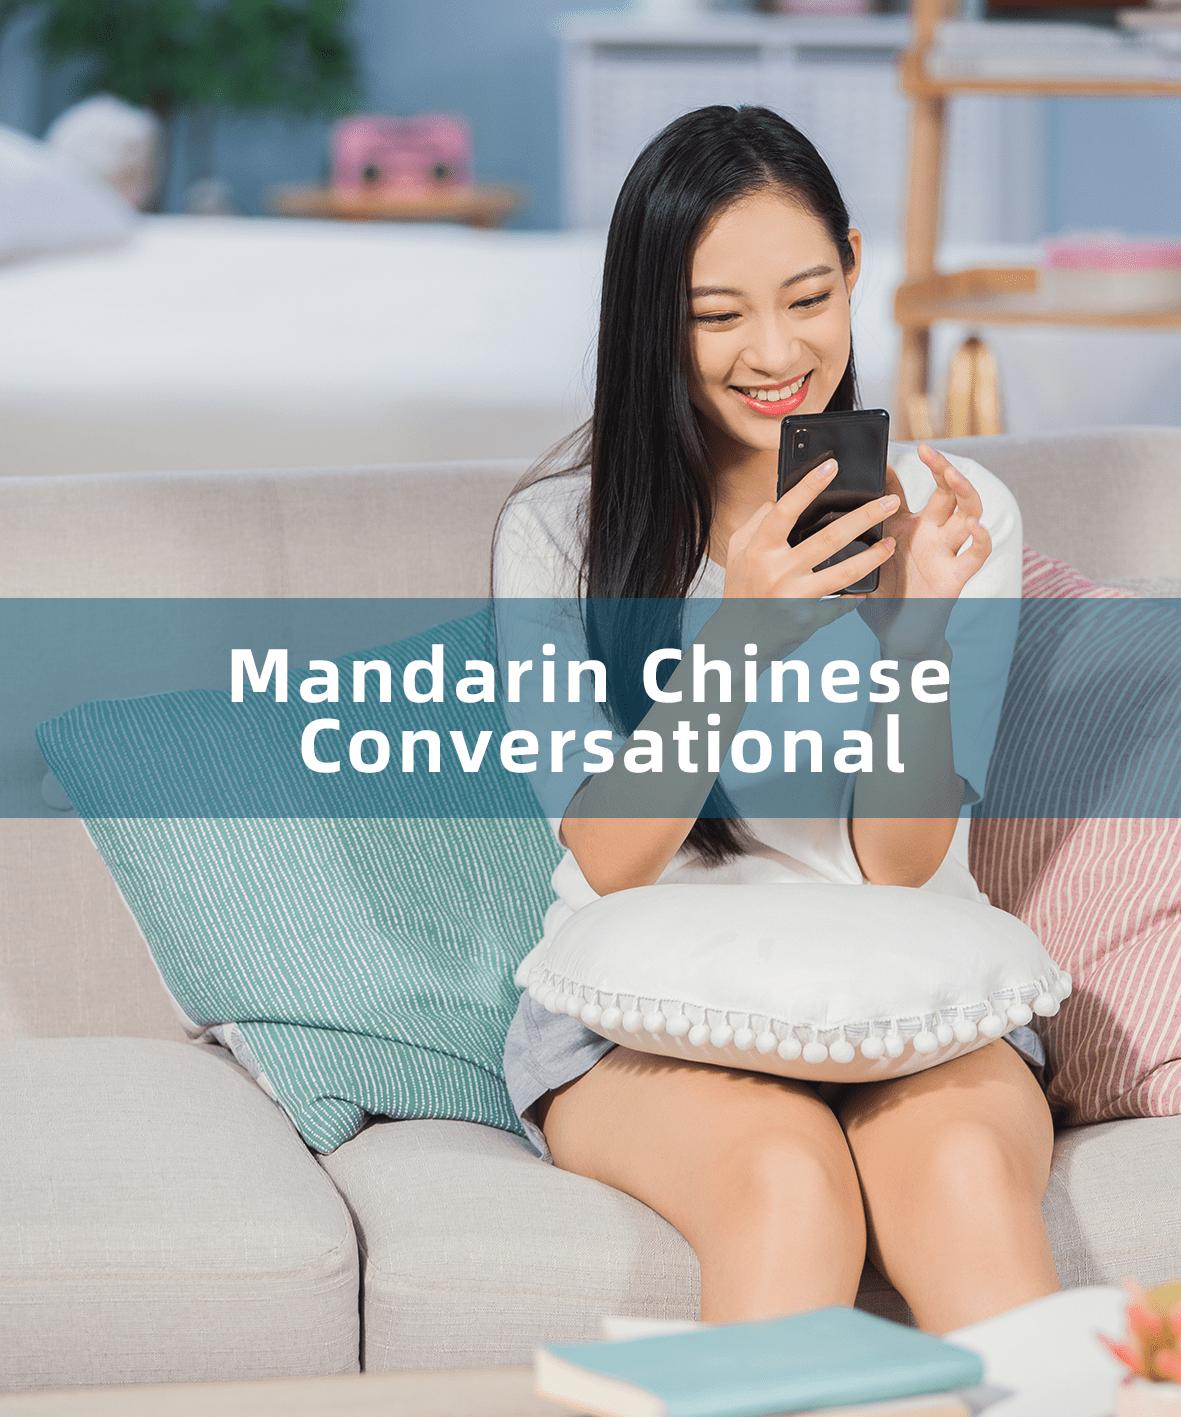 MDT-ASR-B012   中文手机对话音频数据集